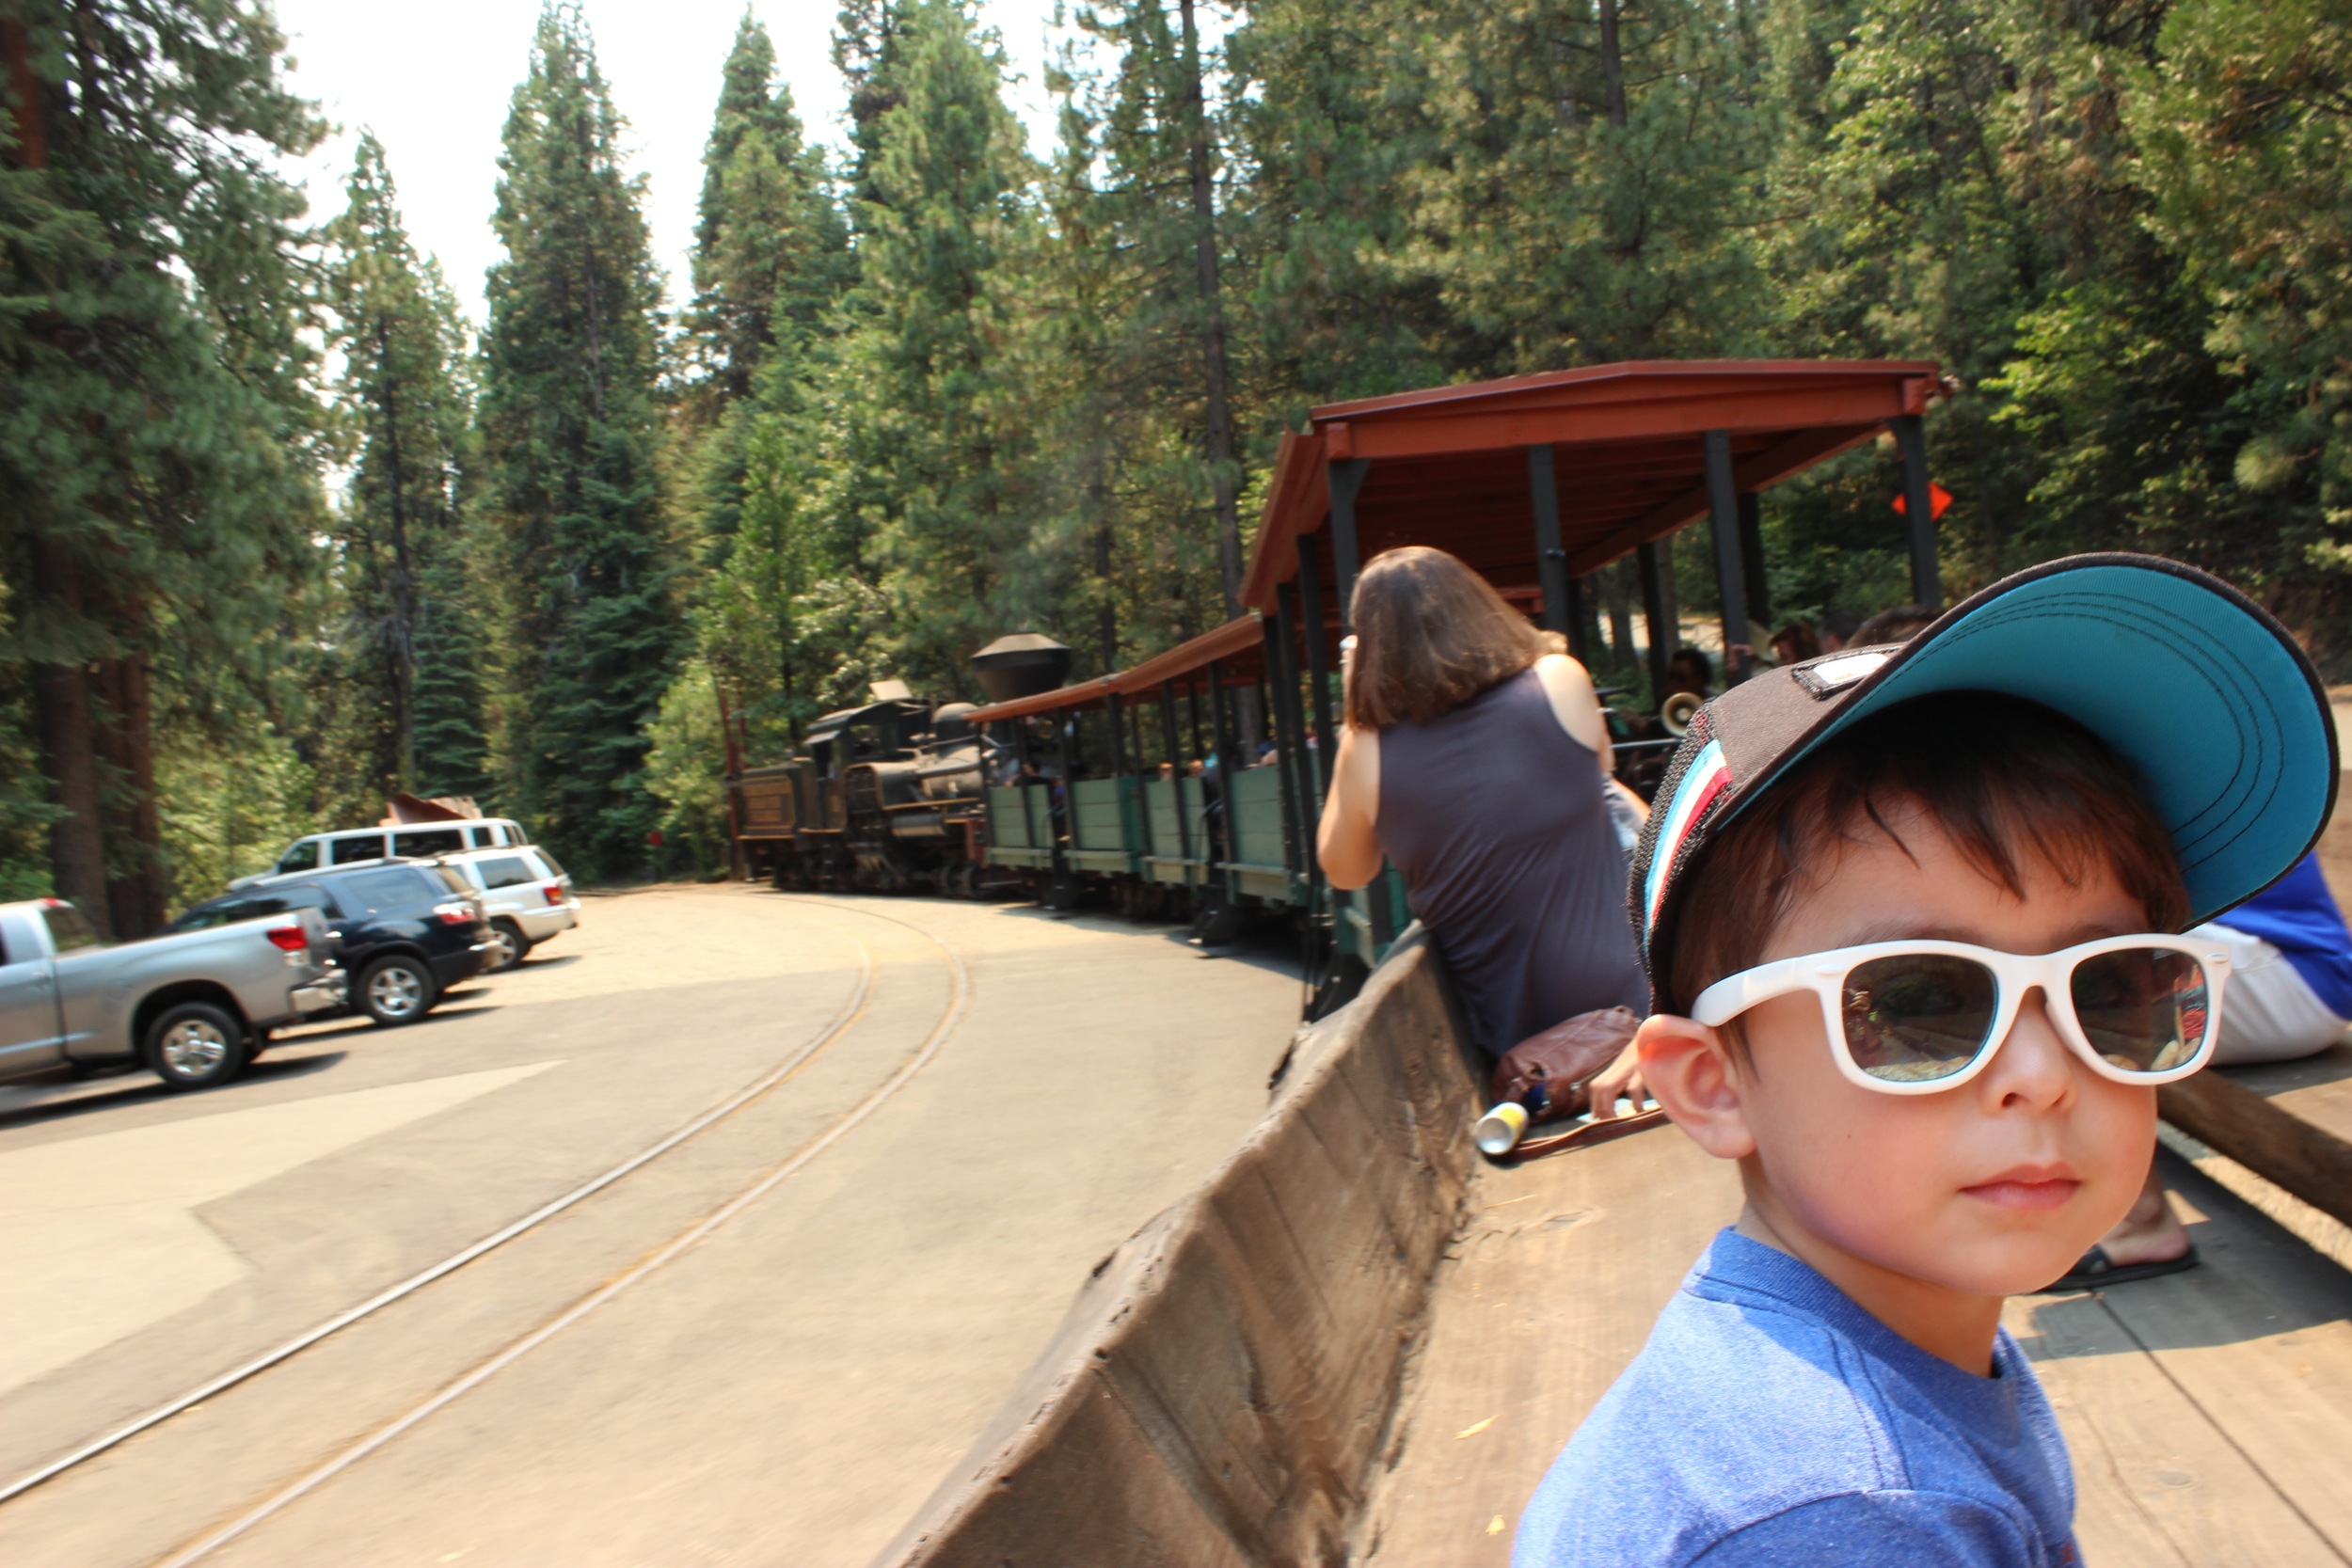 Coarsegold_Ca_KOA_Camping August_2015124.jpg